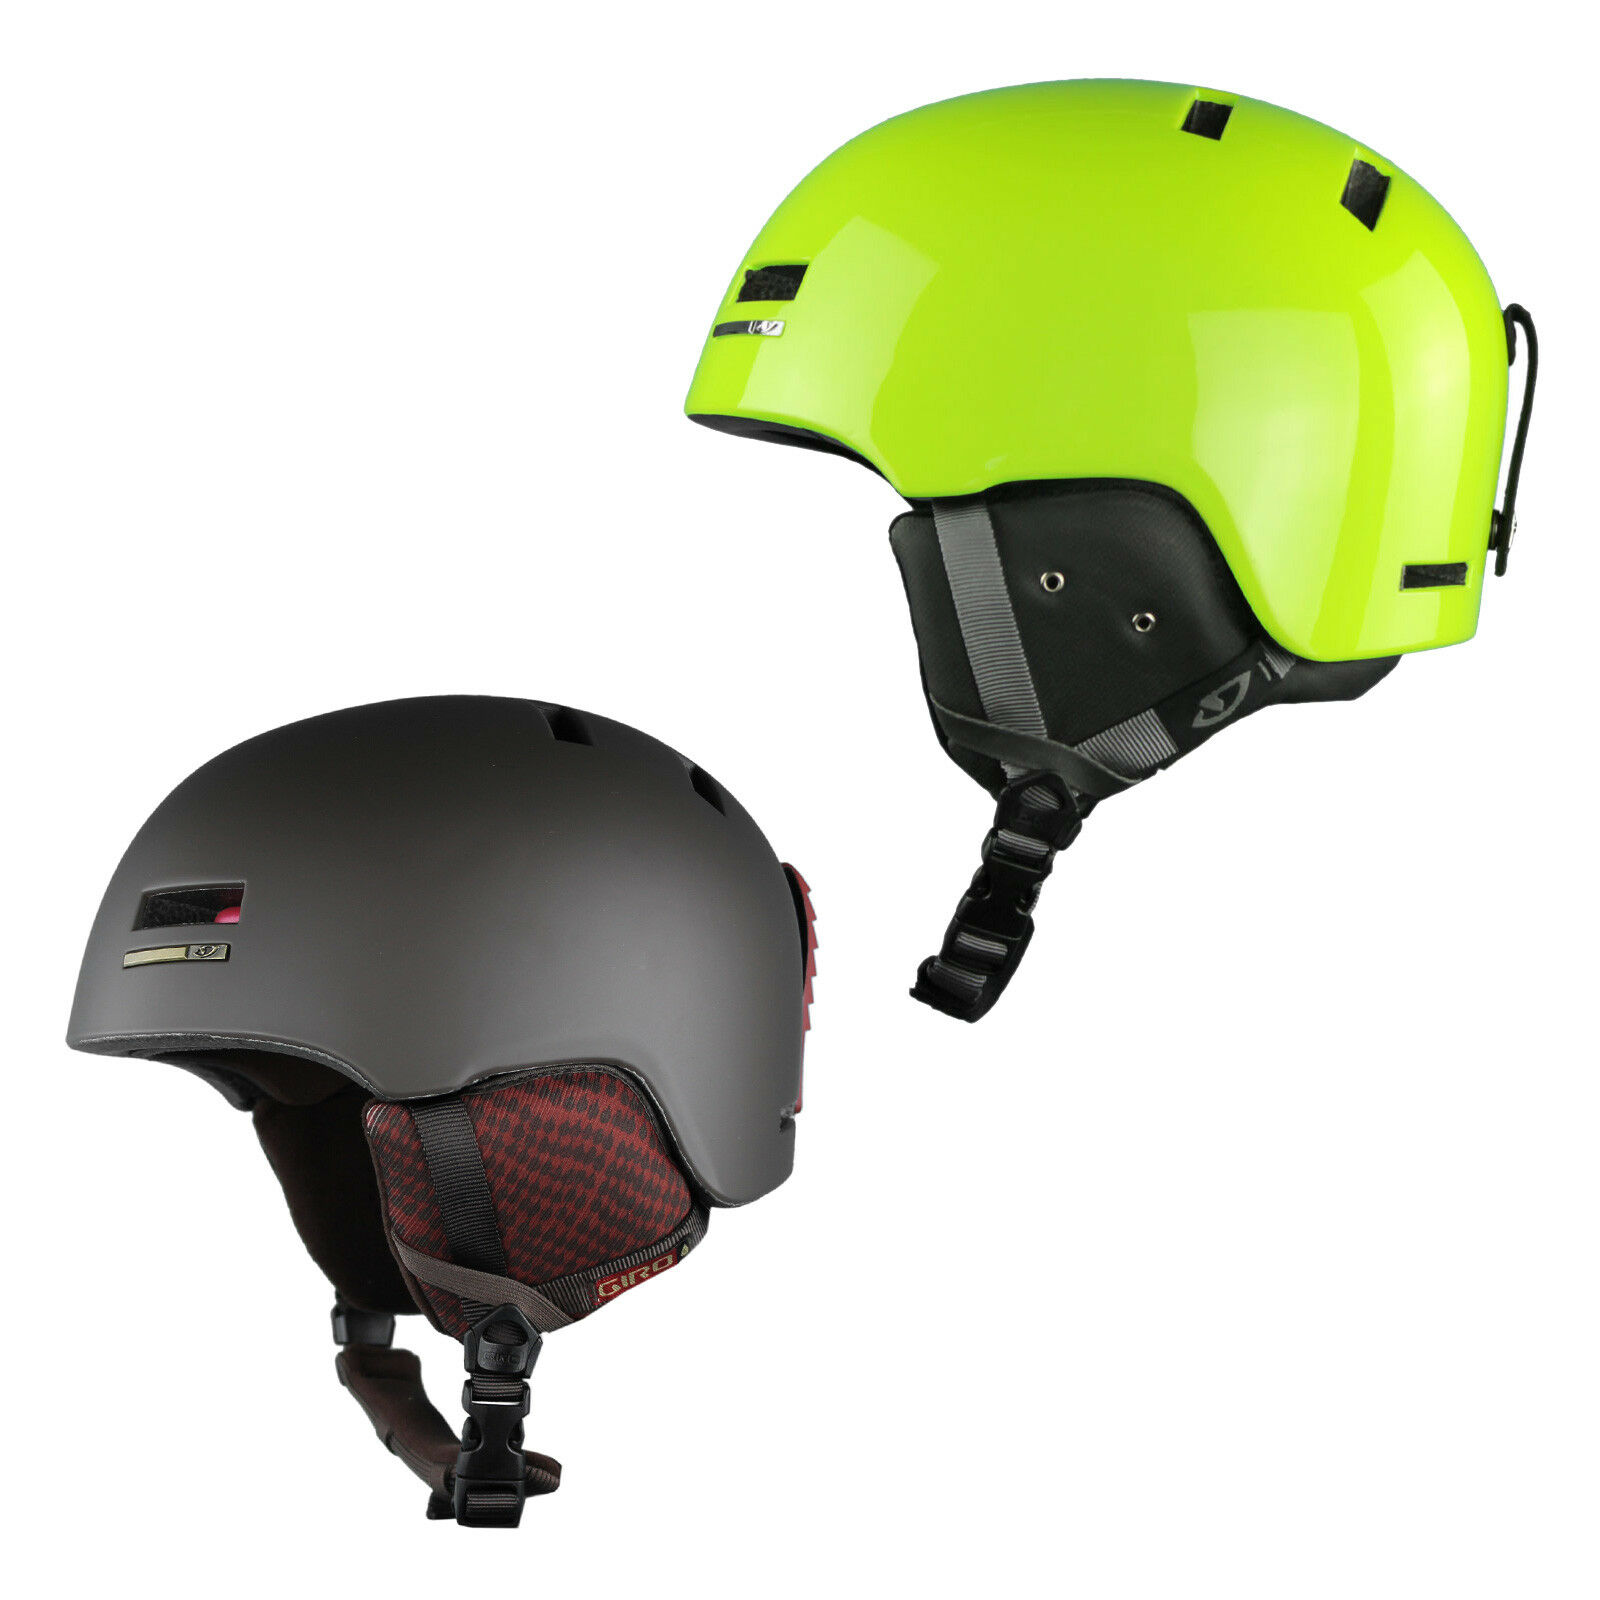 Giro Shiv 2 - Uomo Casco da Sci Snowboard Casco Freeride Casco Helmet Nuovo